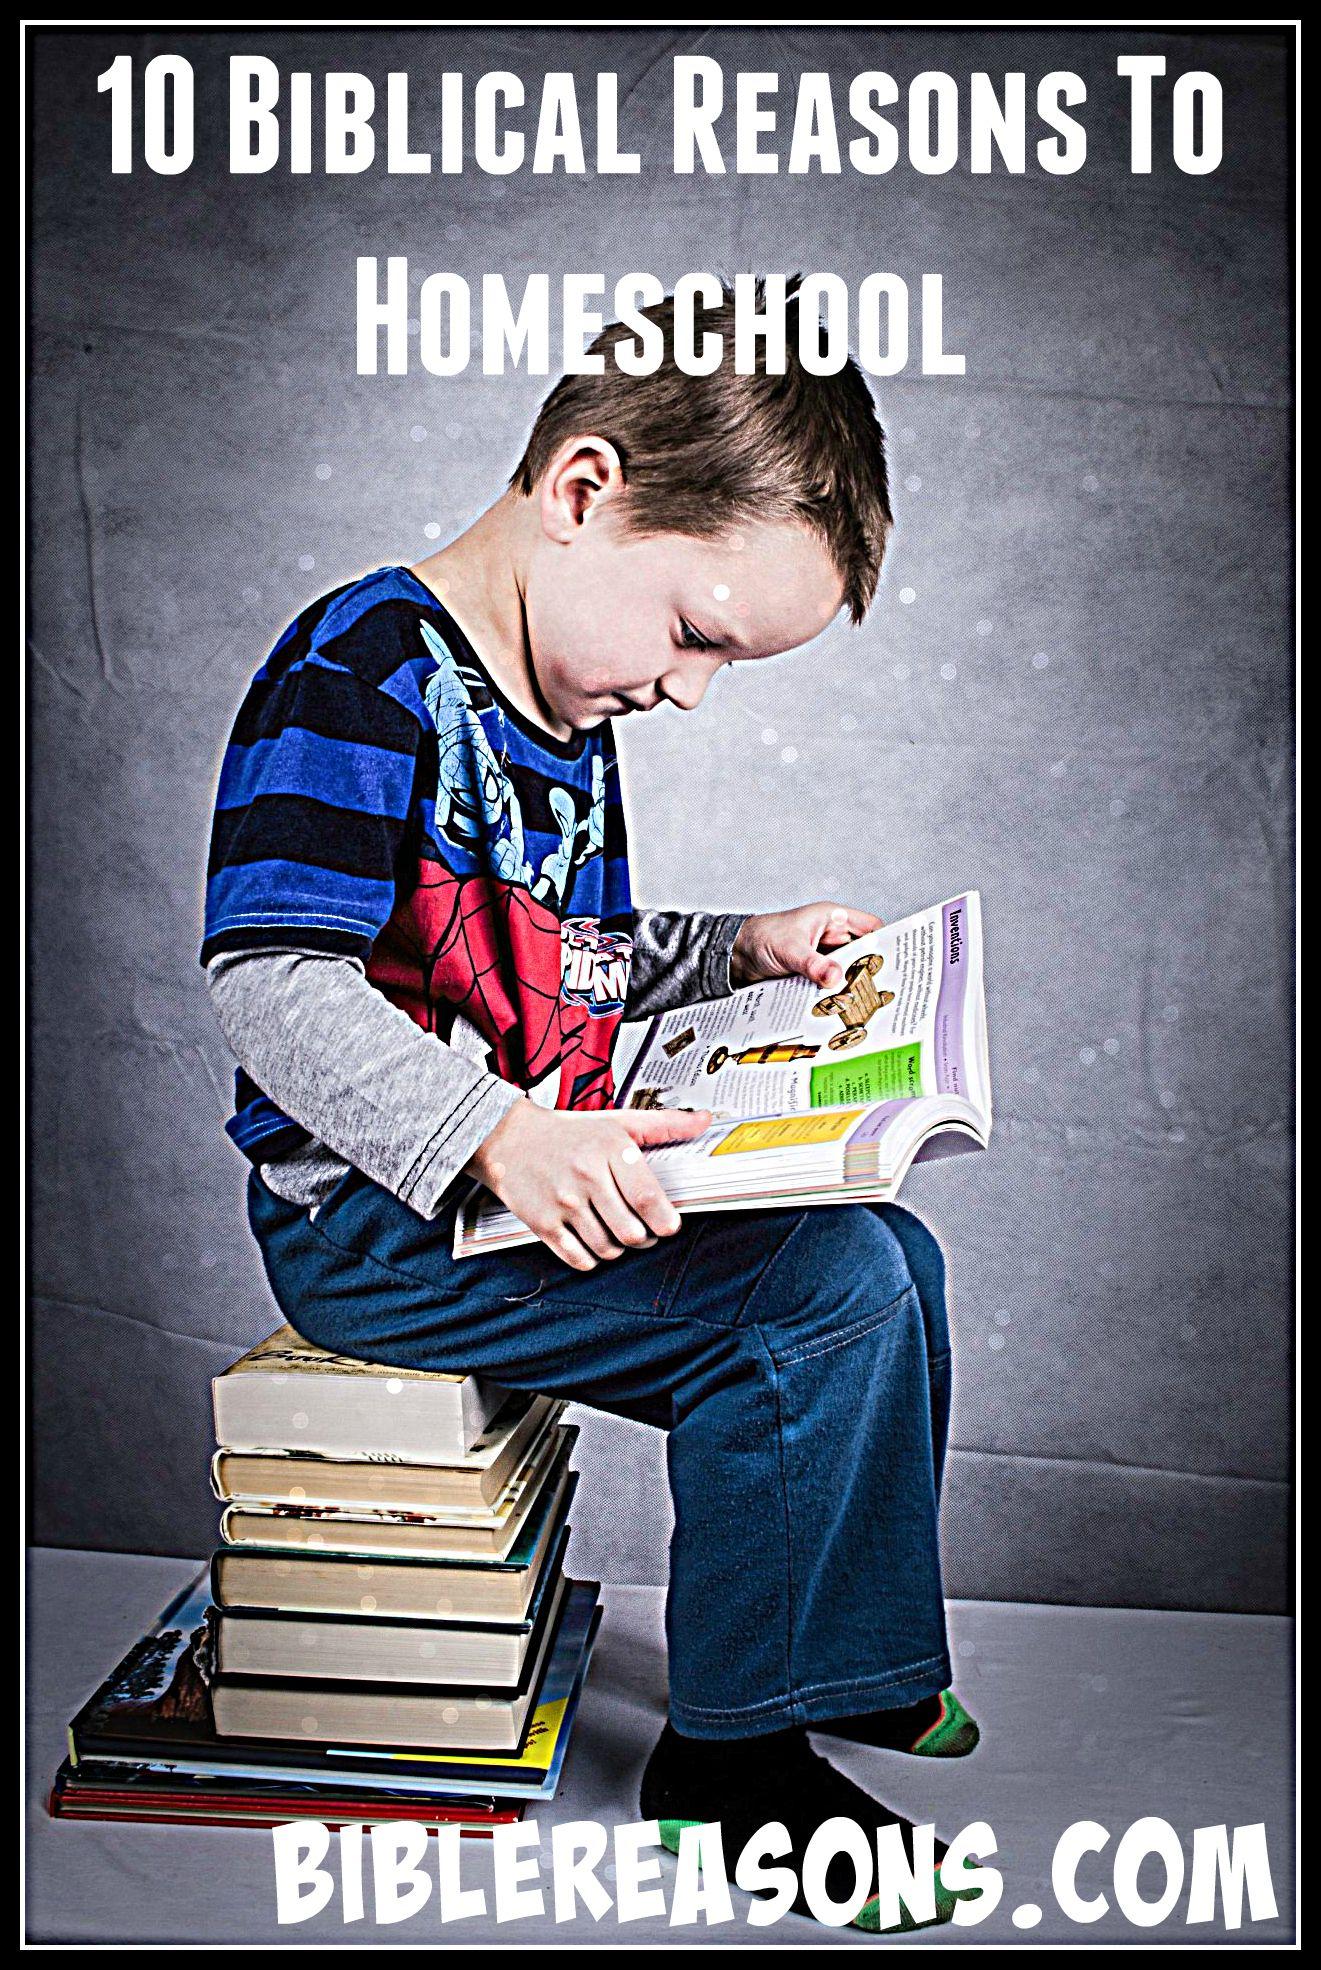 Biblical Reasons To Homeschool